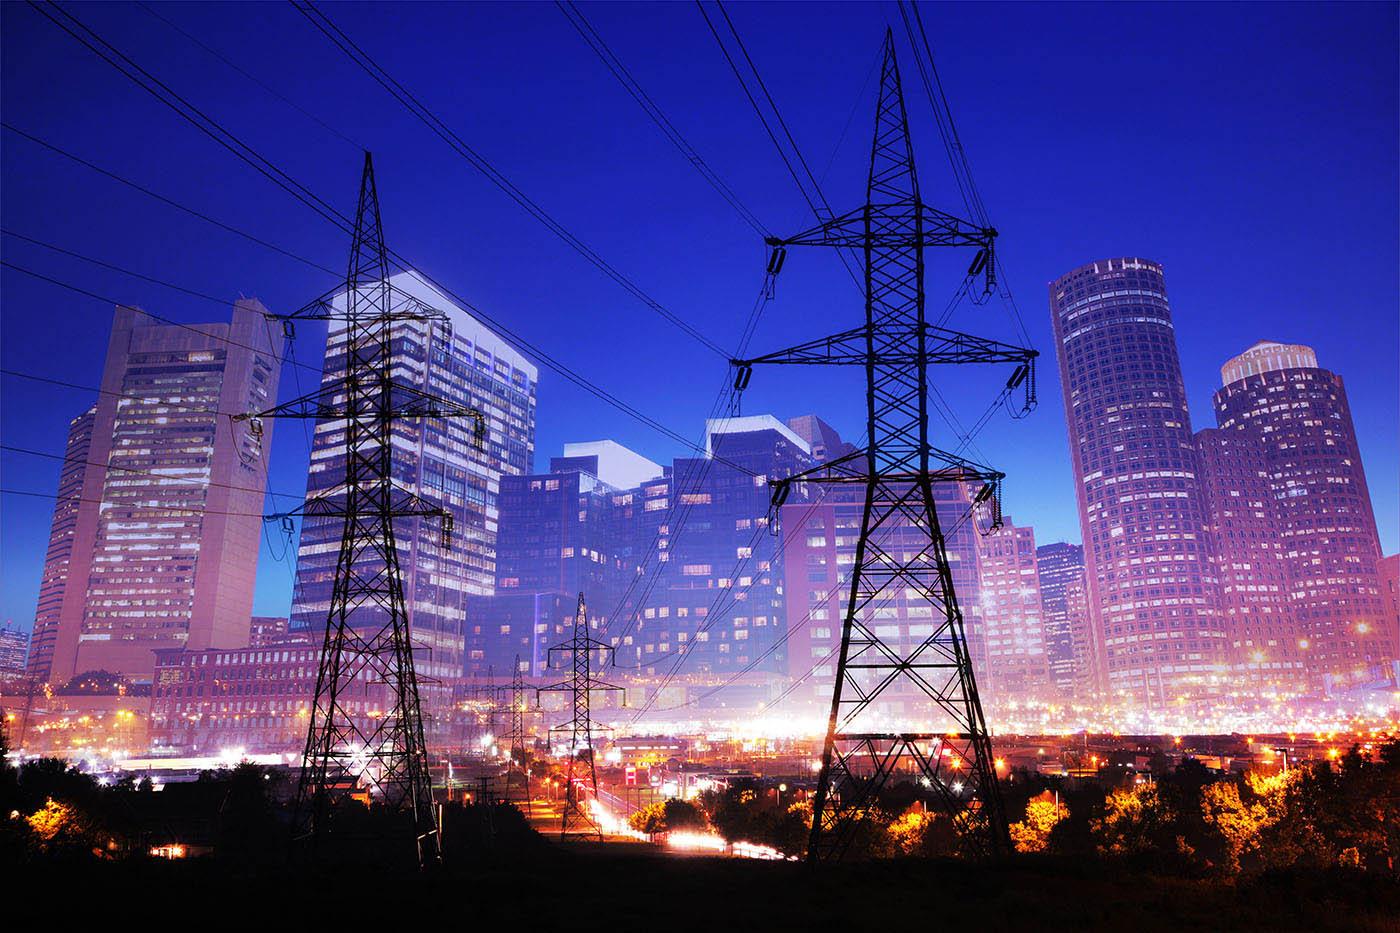 Urban Energy 2 - Stock Photography